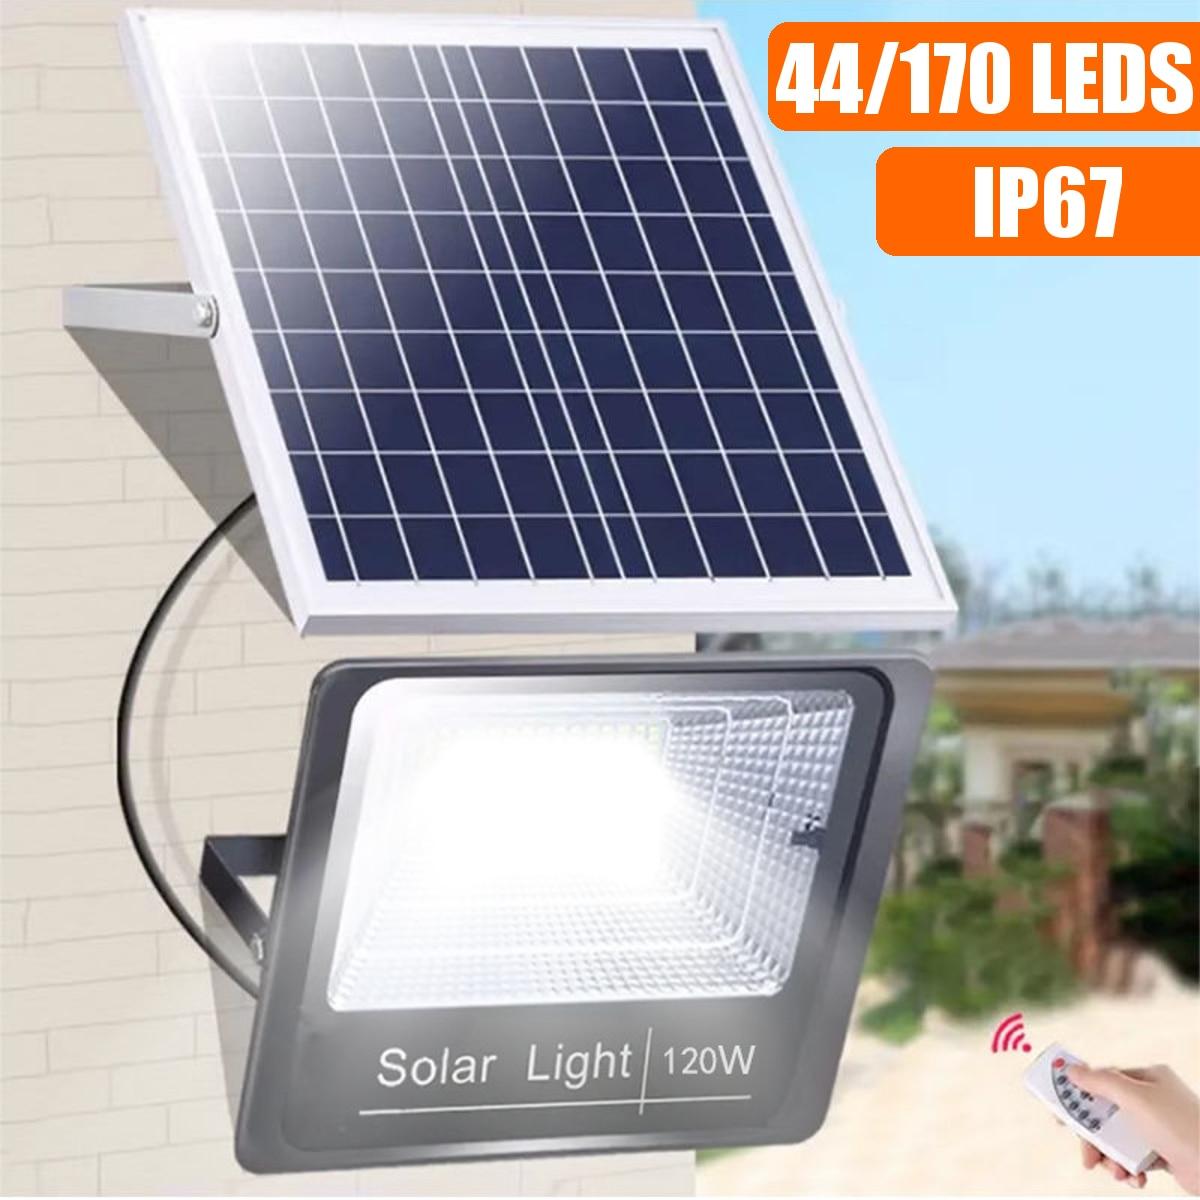 44/170 LEDs Solar Light Outdoor Waterproof For Garden Path Street Outdoor Landscape Spotlight Wall Flood Lamp